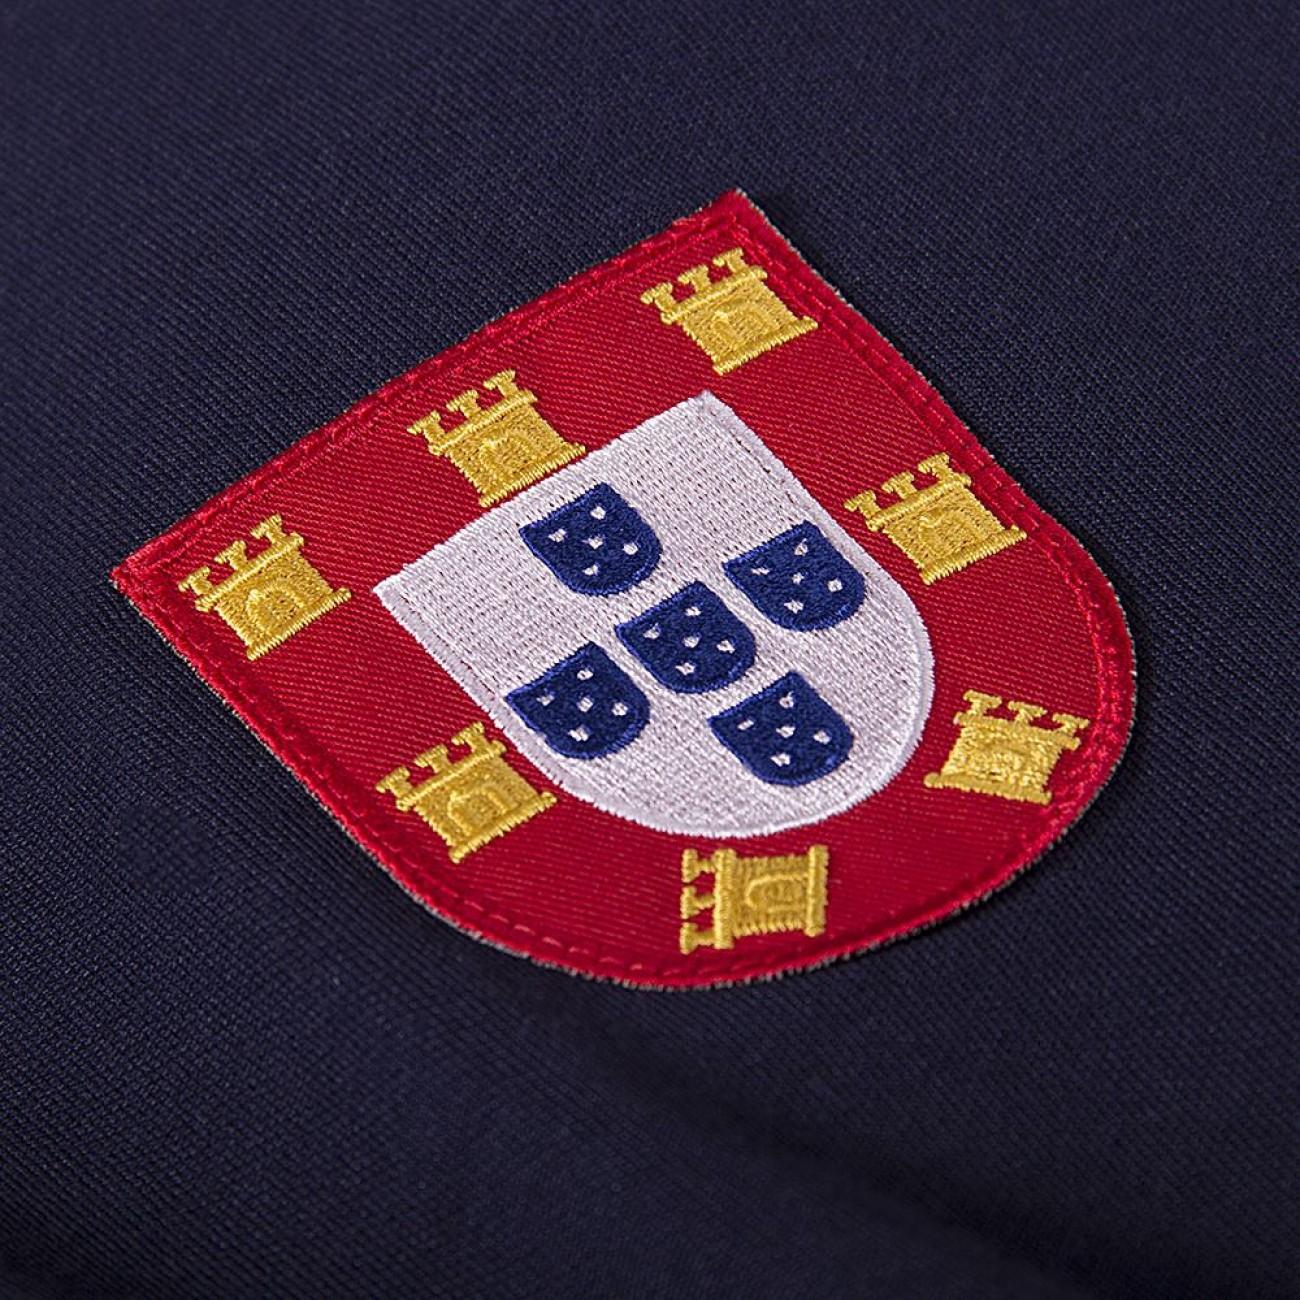 ece4372b82 Casaco Portugal 1972